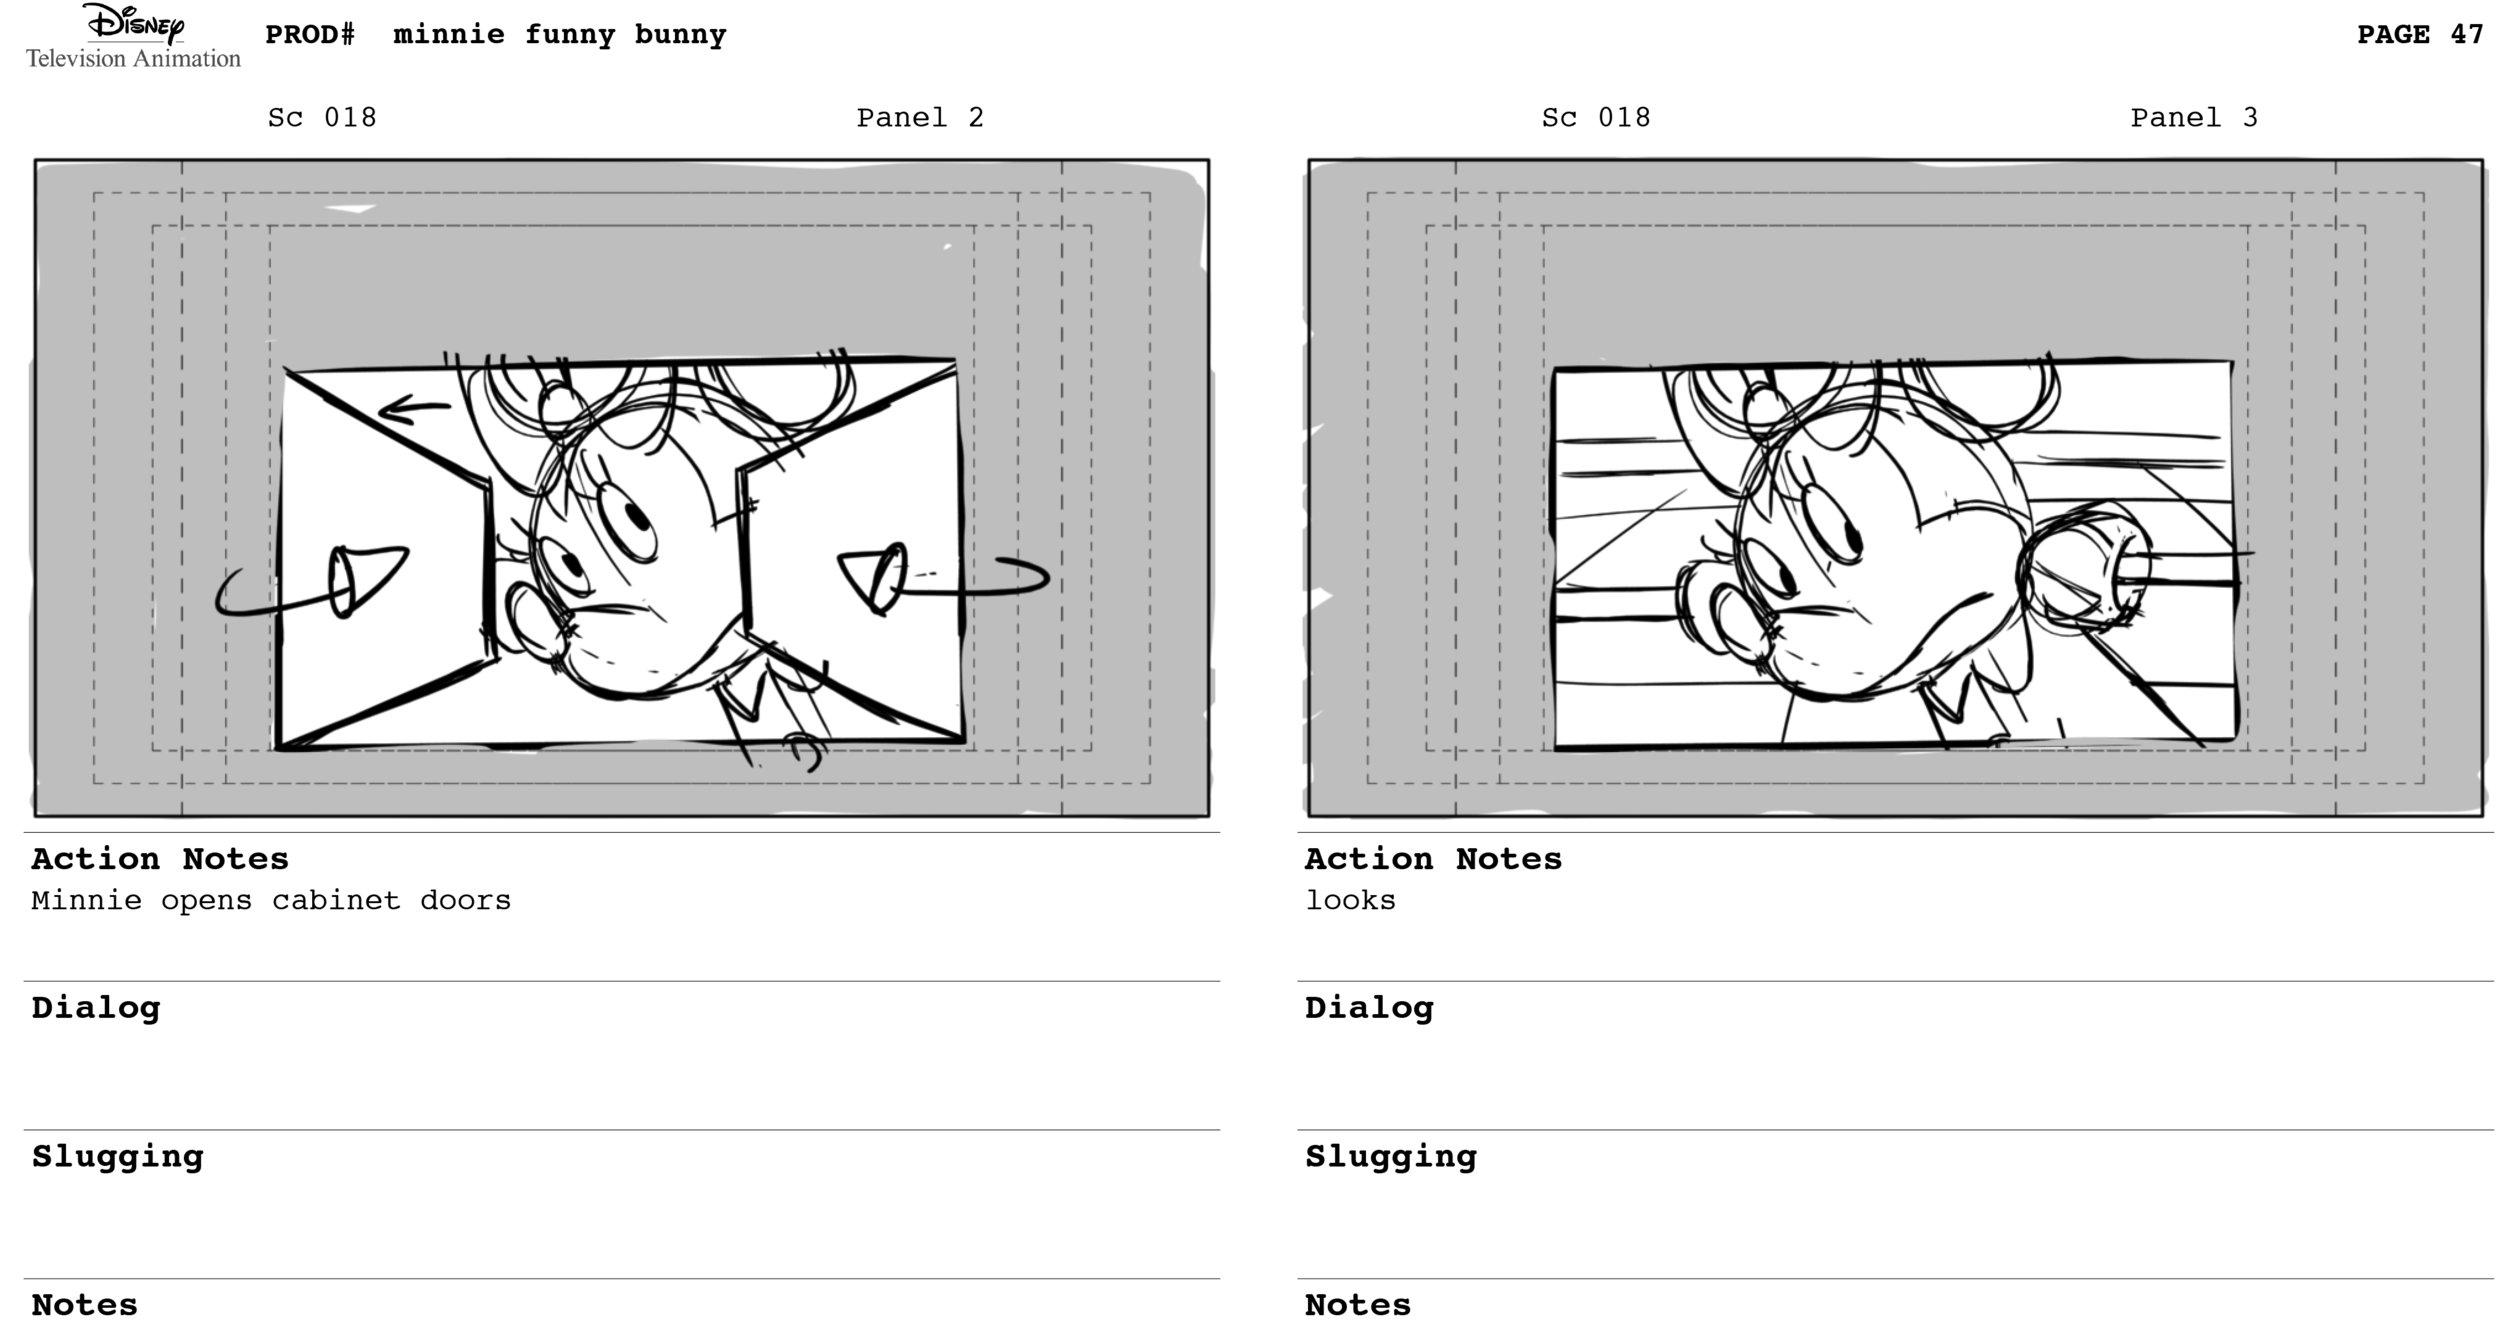 Funny_Bunny-48.jpg